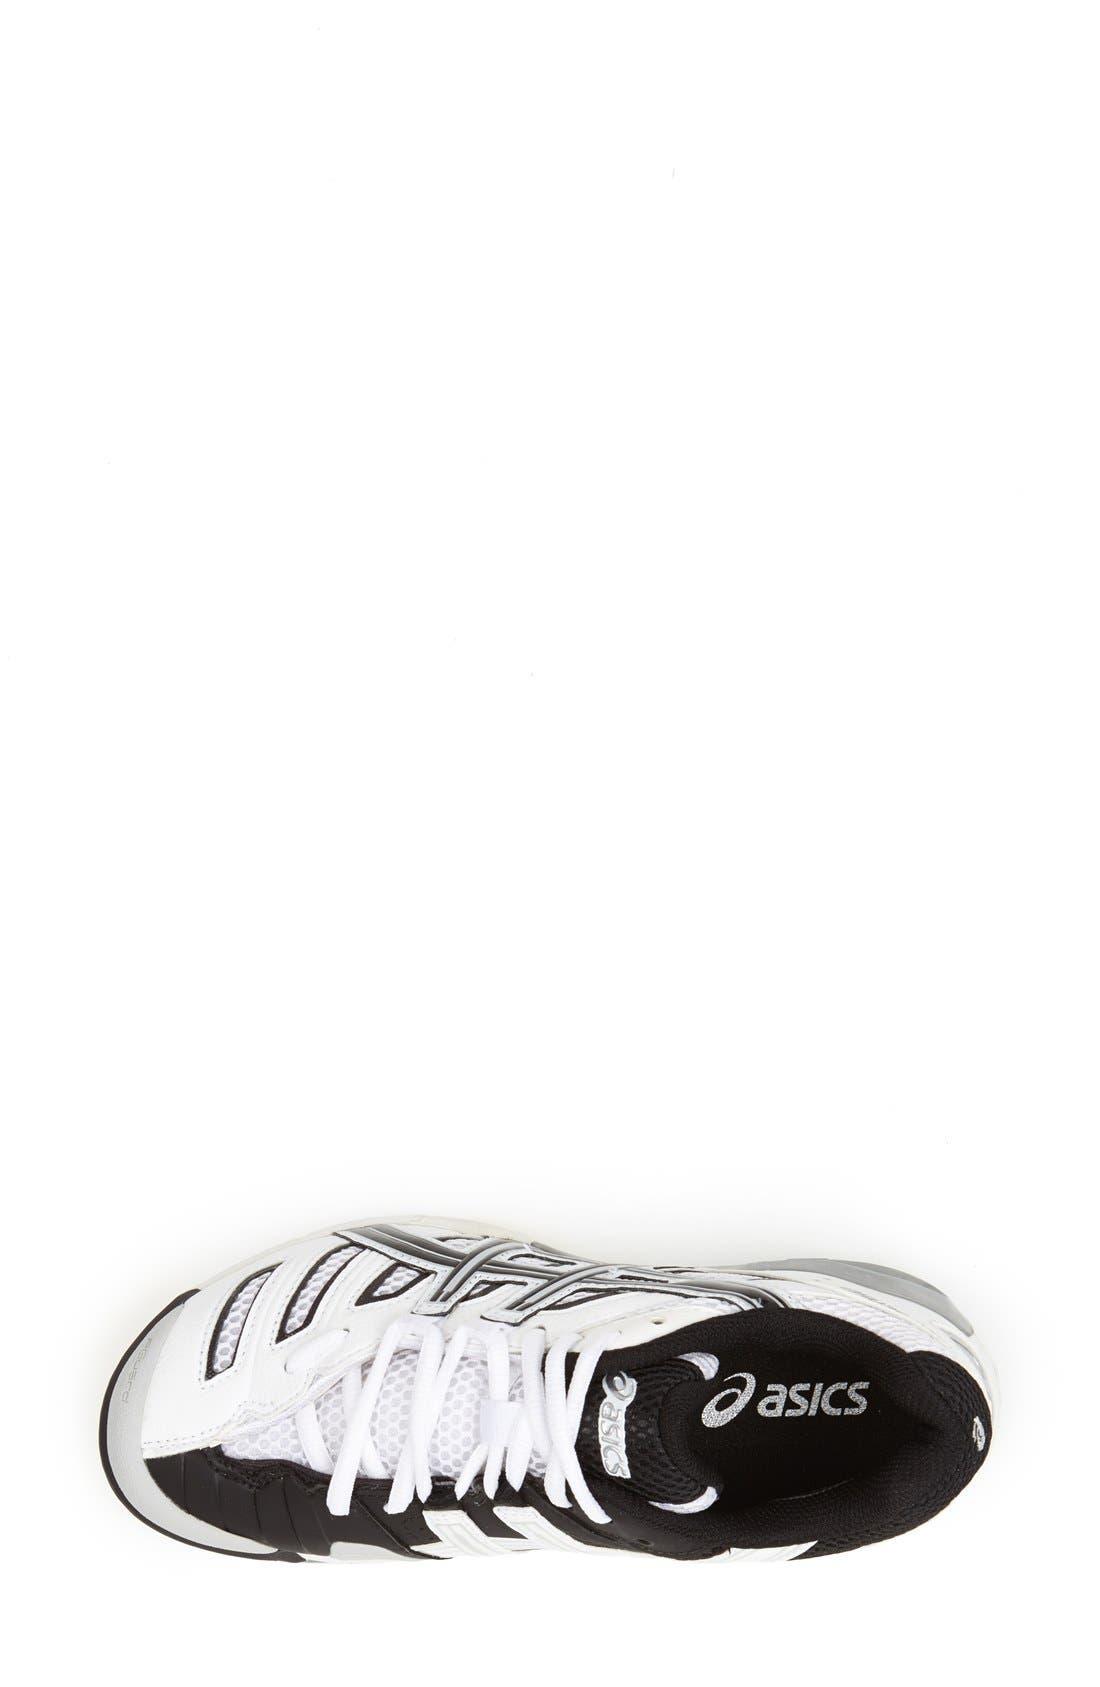 Alternate Image 3  - ASICS® 'GEL-Sensei 4' Volleyball Shoe (Women)